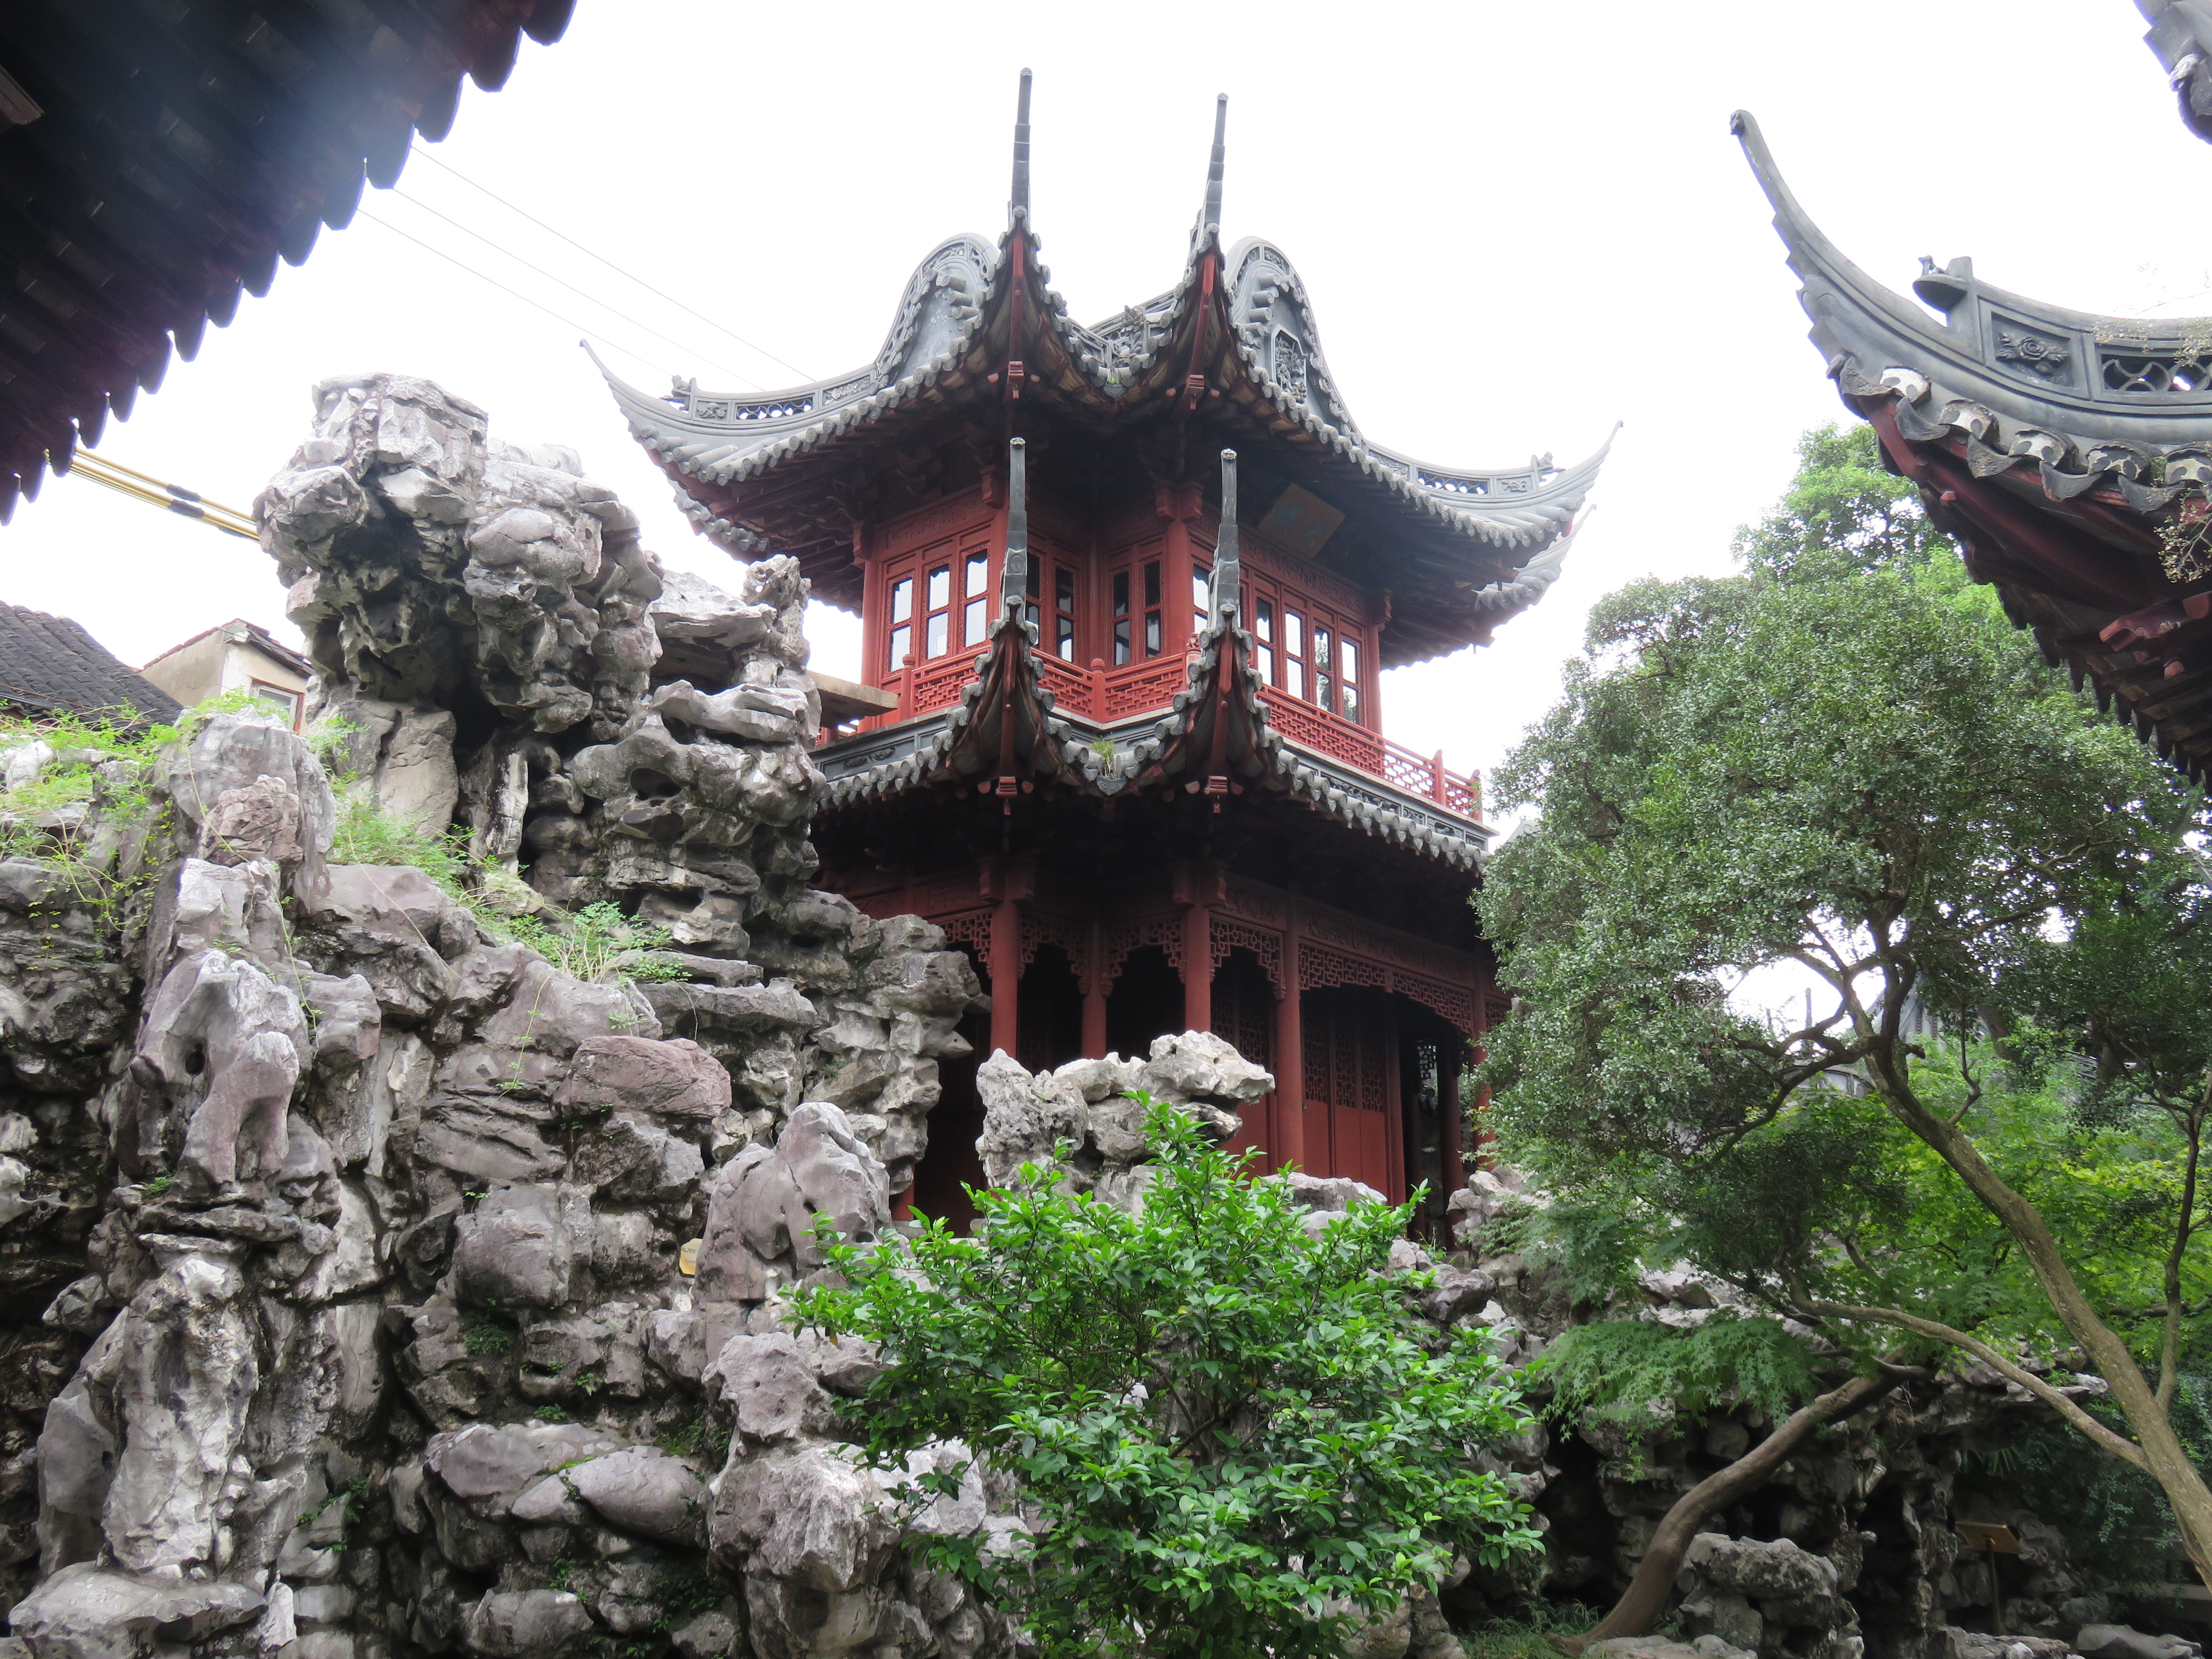 parc shanghai yuyuan voyagespia - Chine